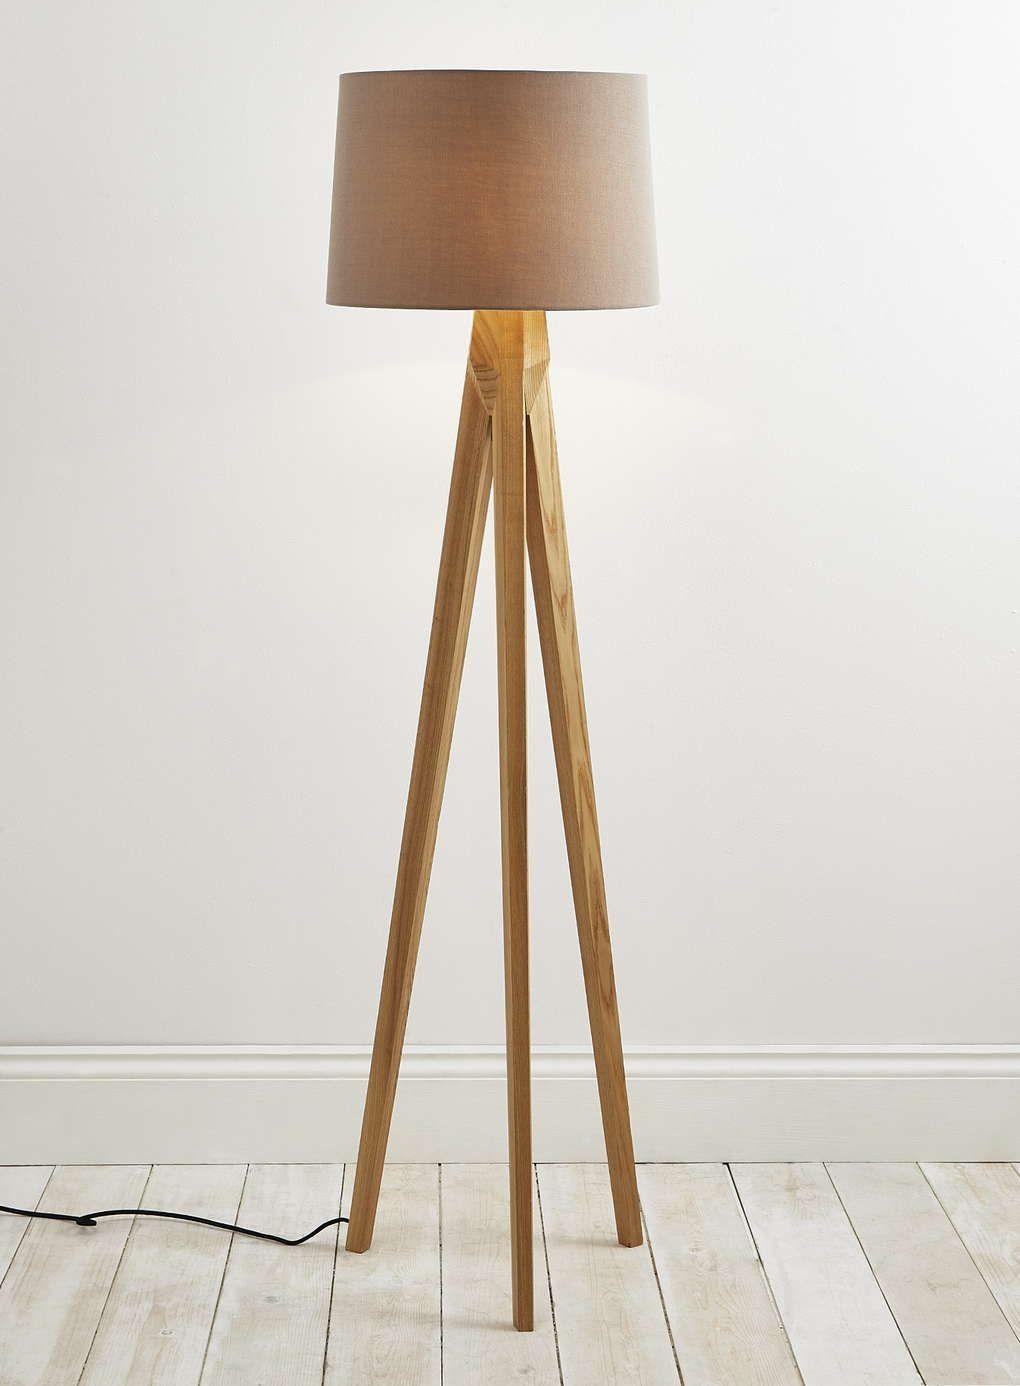 Zach Tripod Floor Lamp - BHS | Lamps | Pinterest | Tripod, Bhs and ...